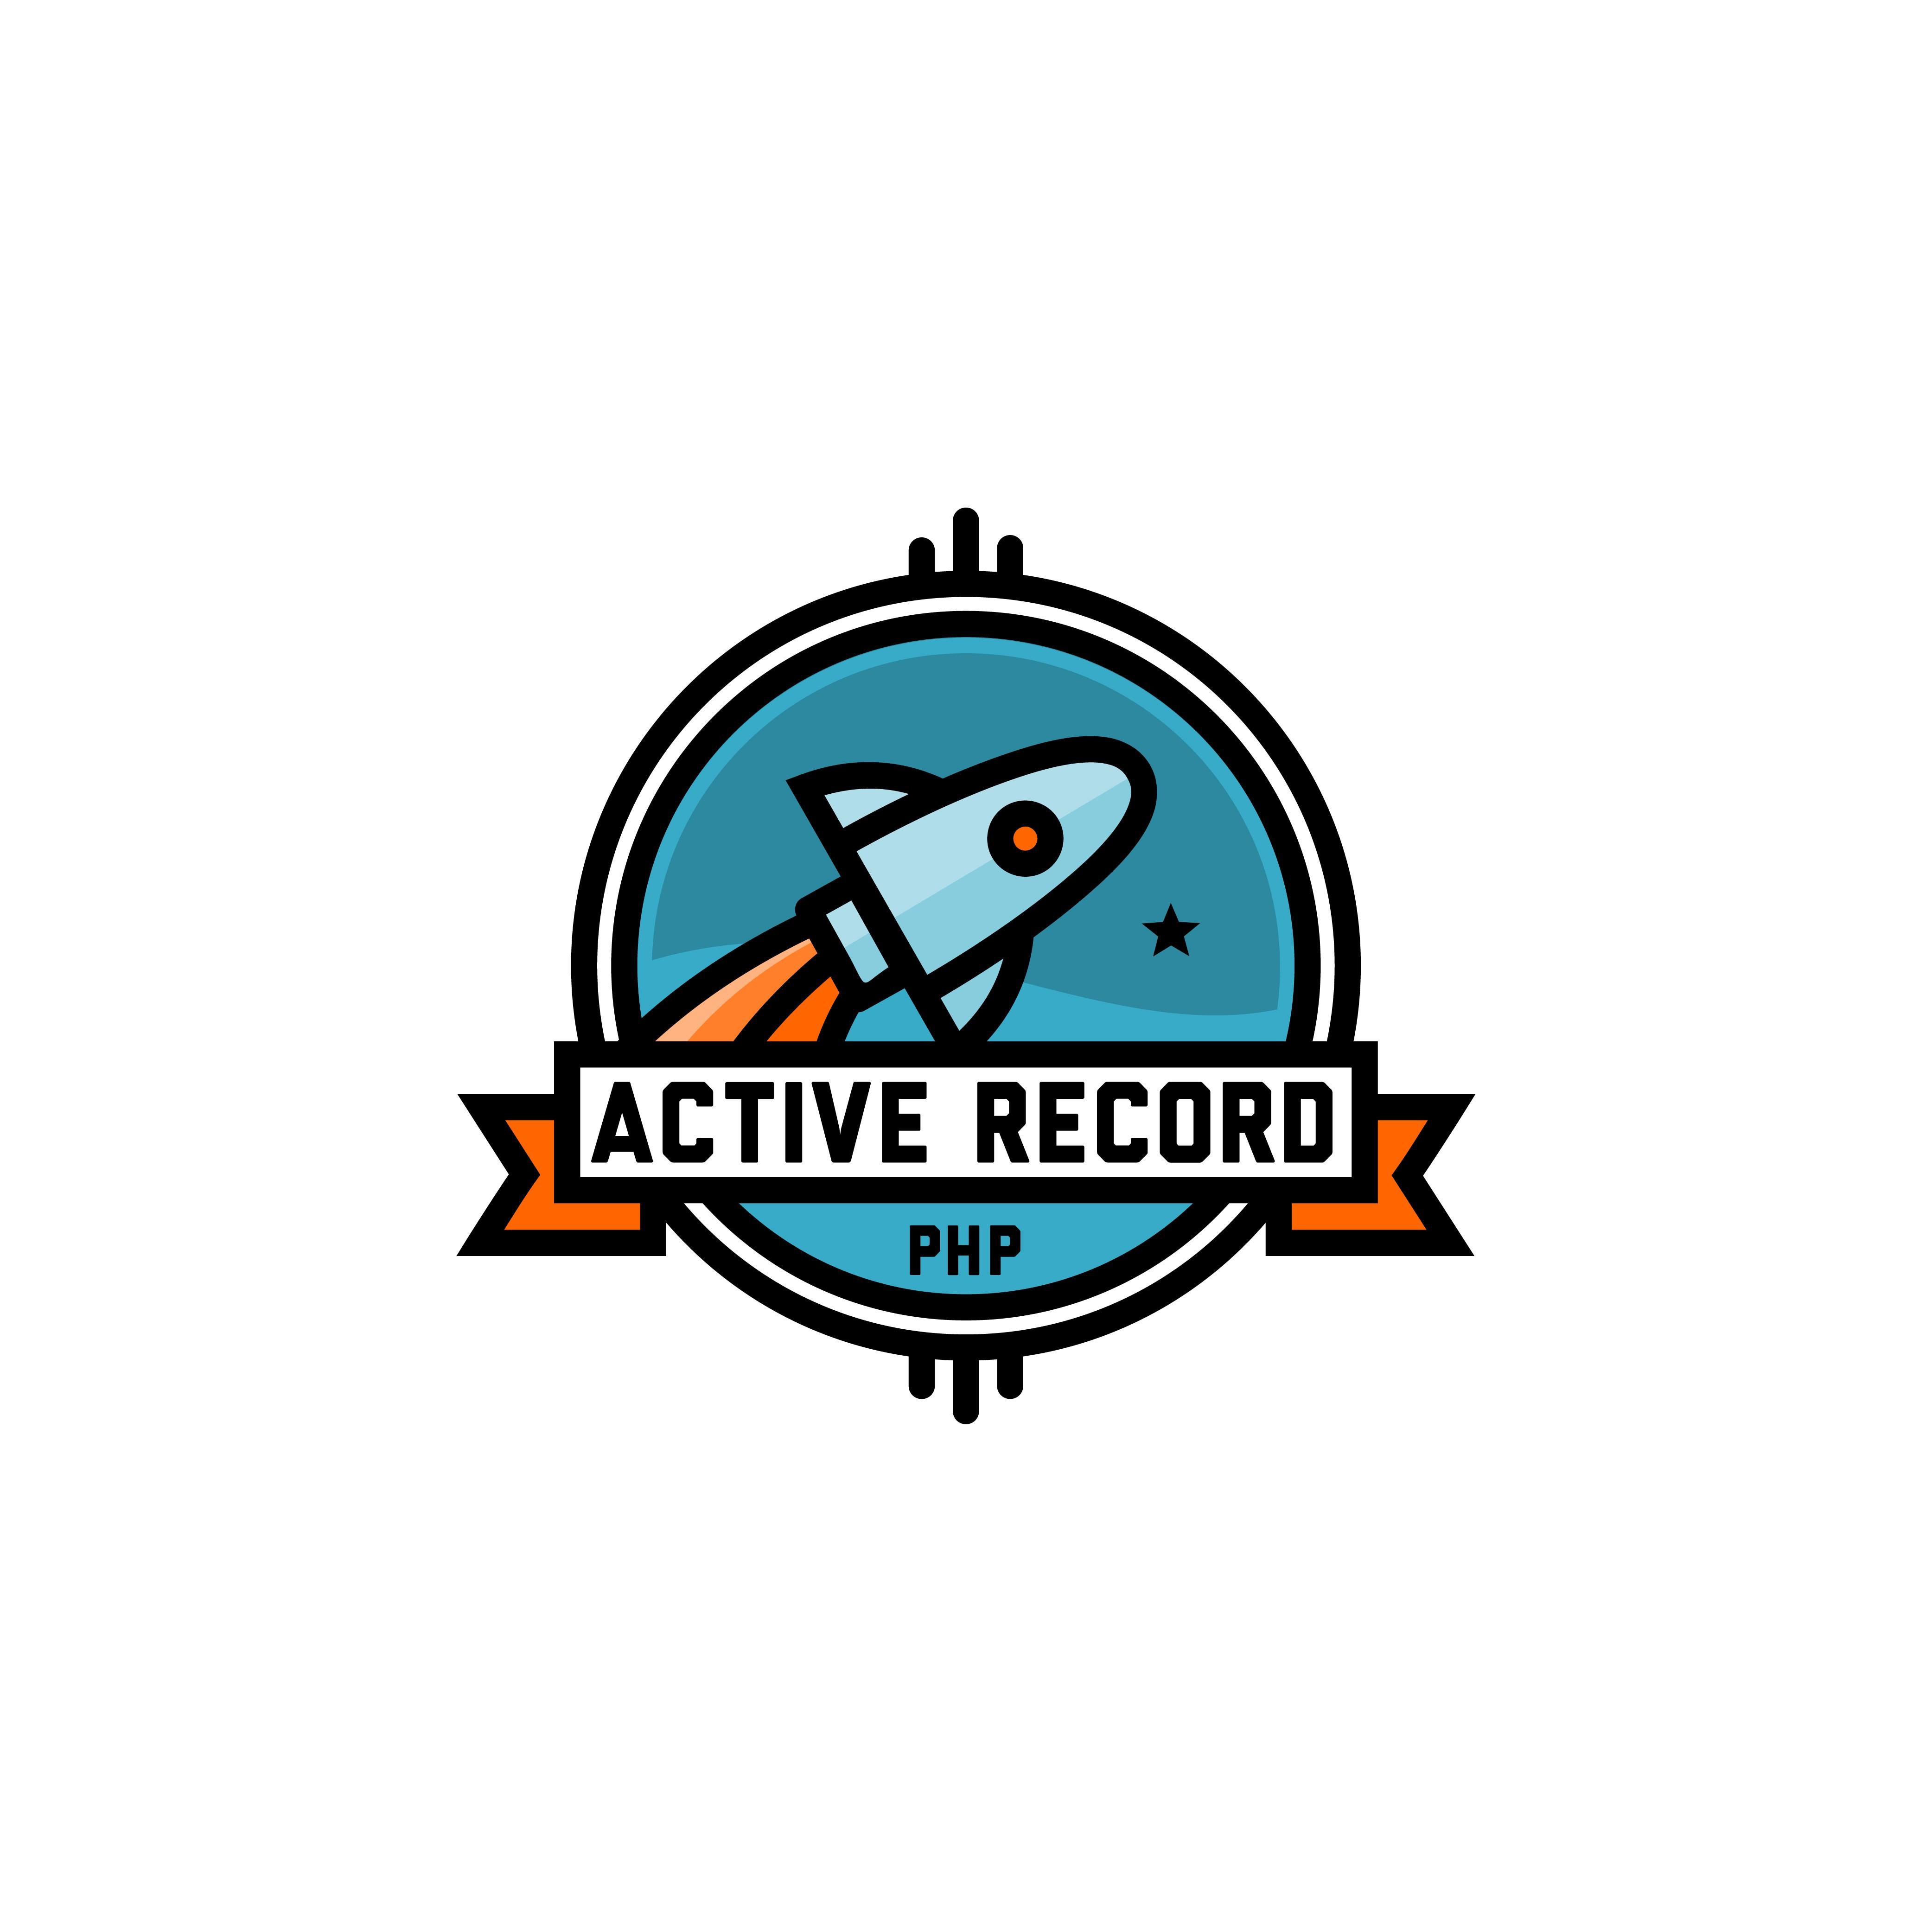 Design a logo for php-activerecord